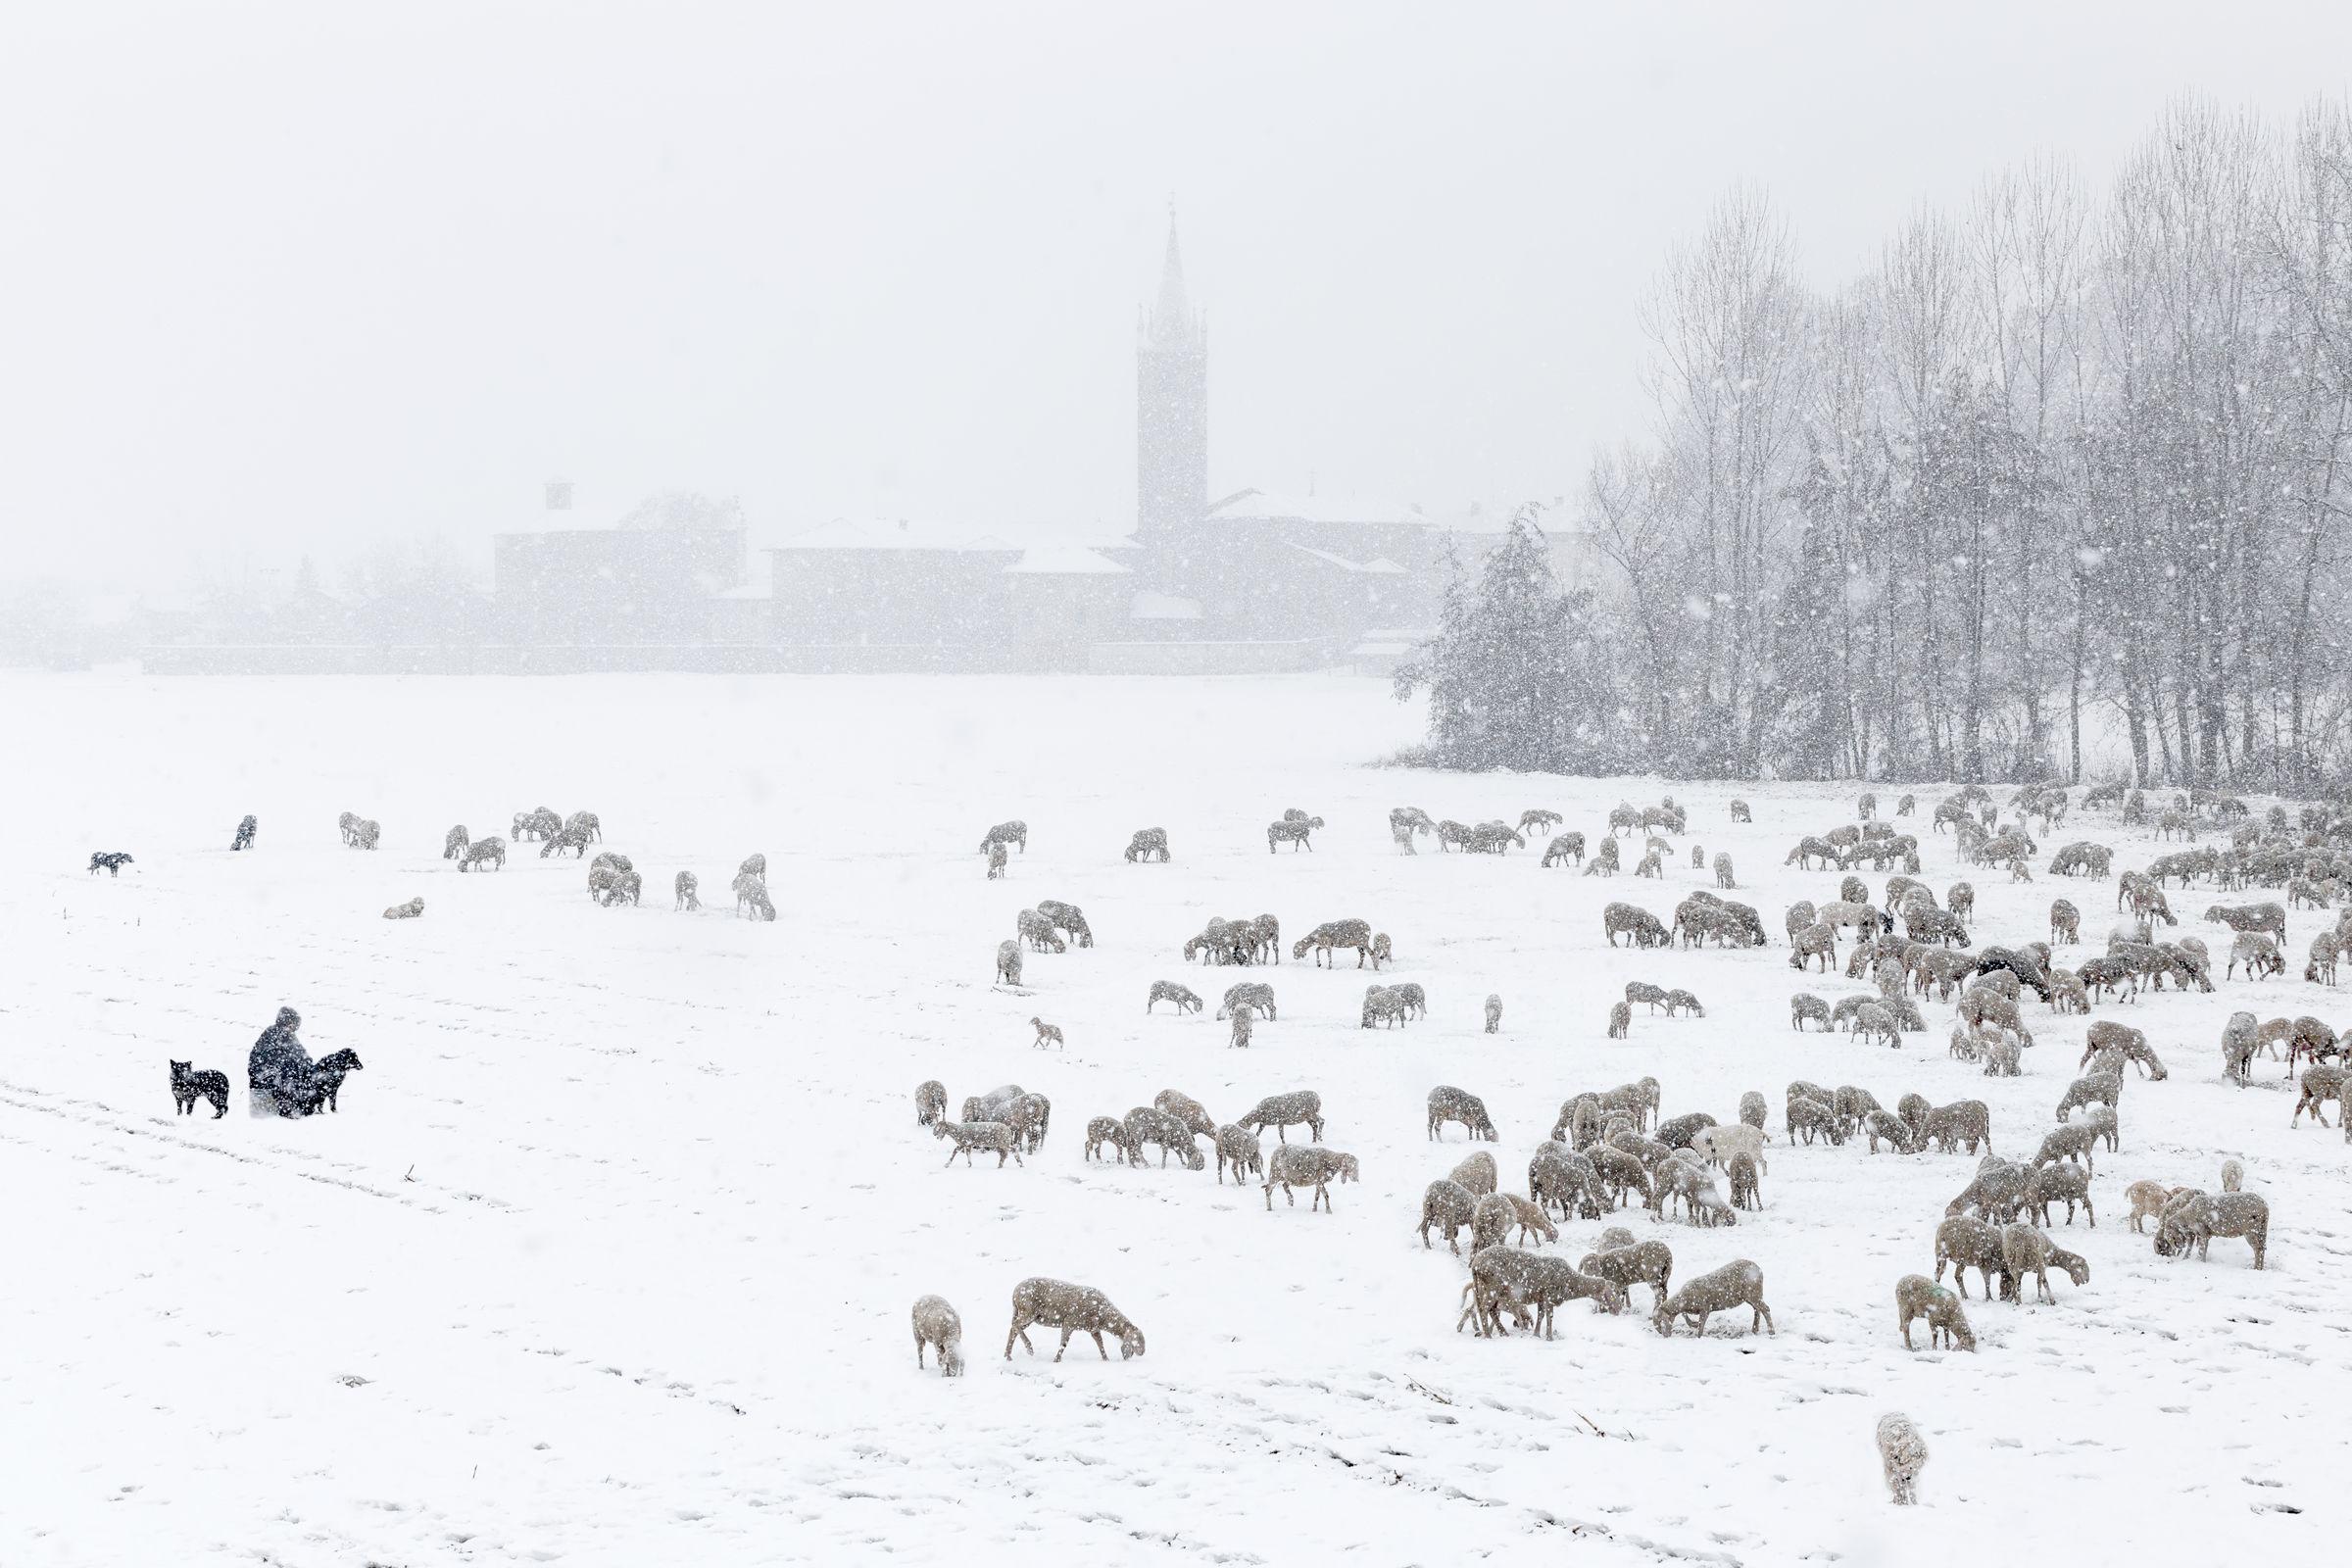 The shepherd in the snow...